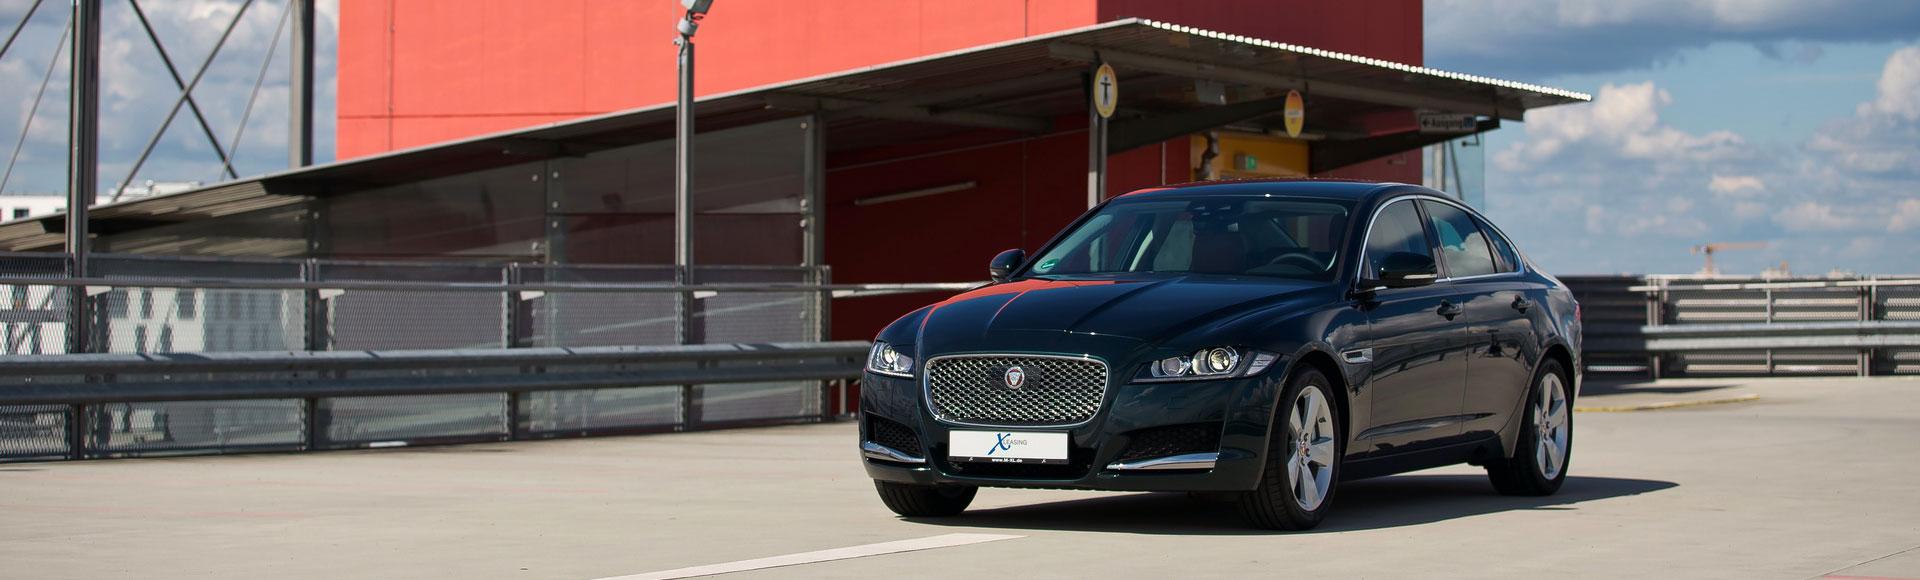 Jaguar XF 2016 165